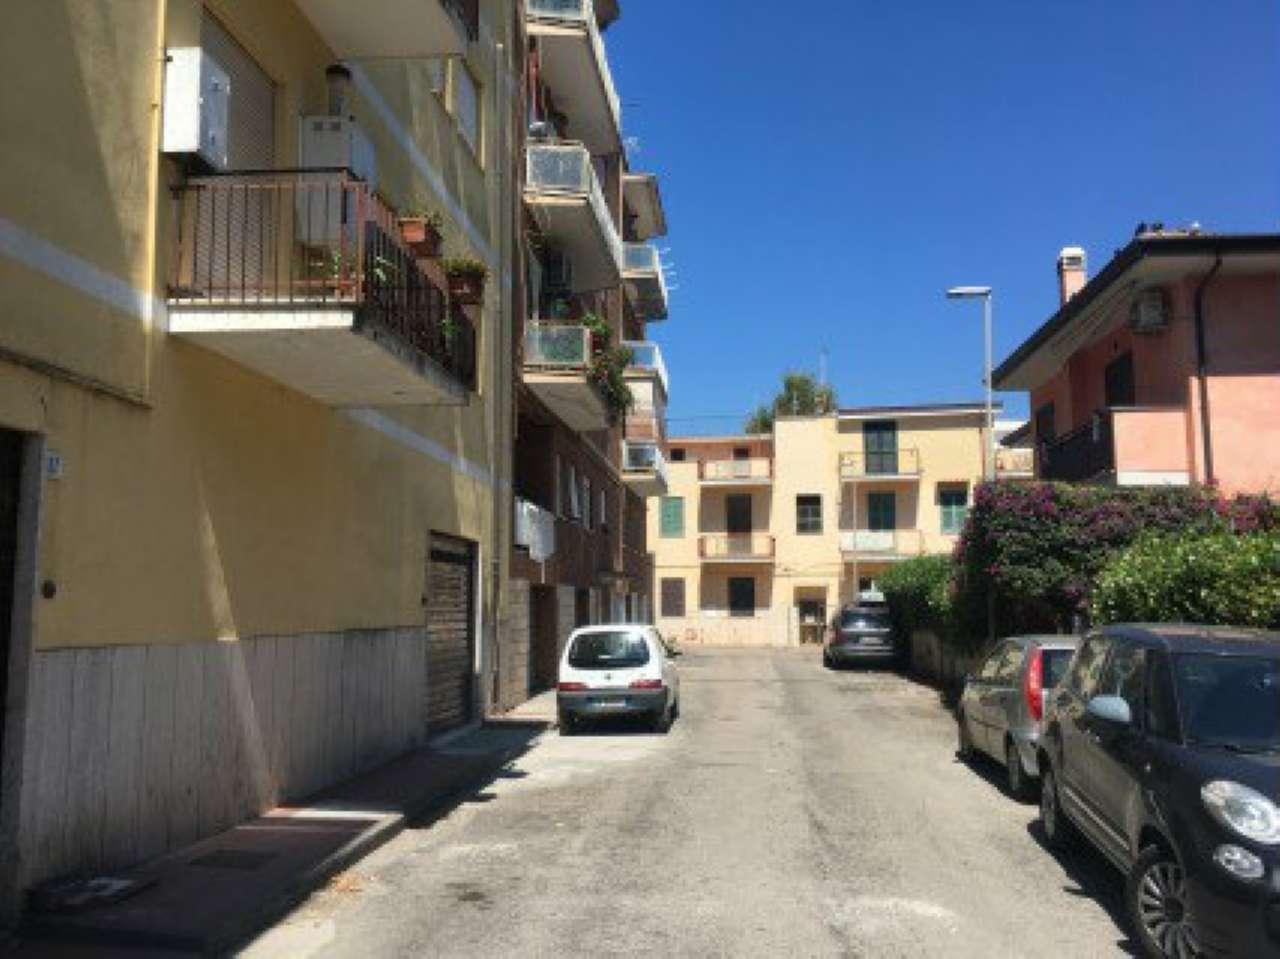 Bilocale, Via Don Morosini, Terracina, foto 19